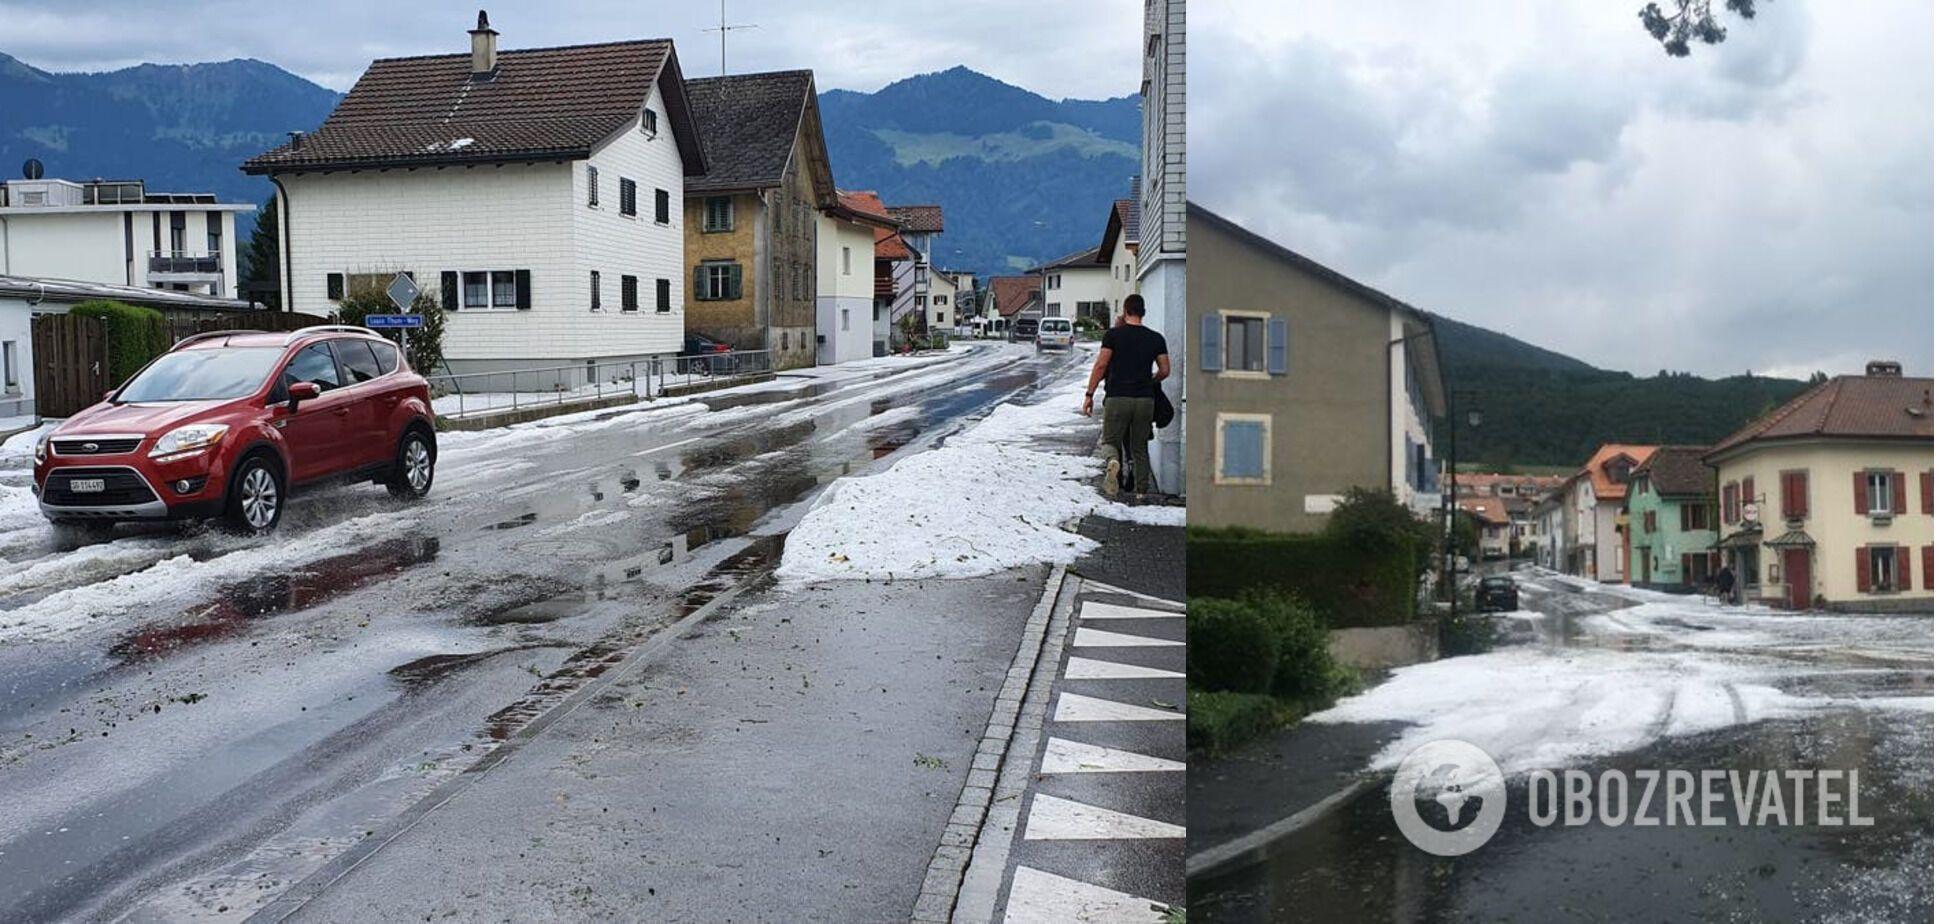 Негода в Швейцарії